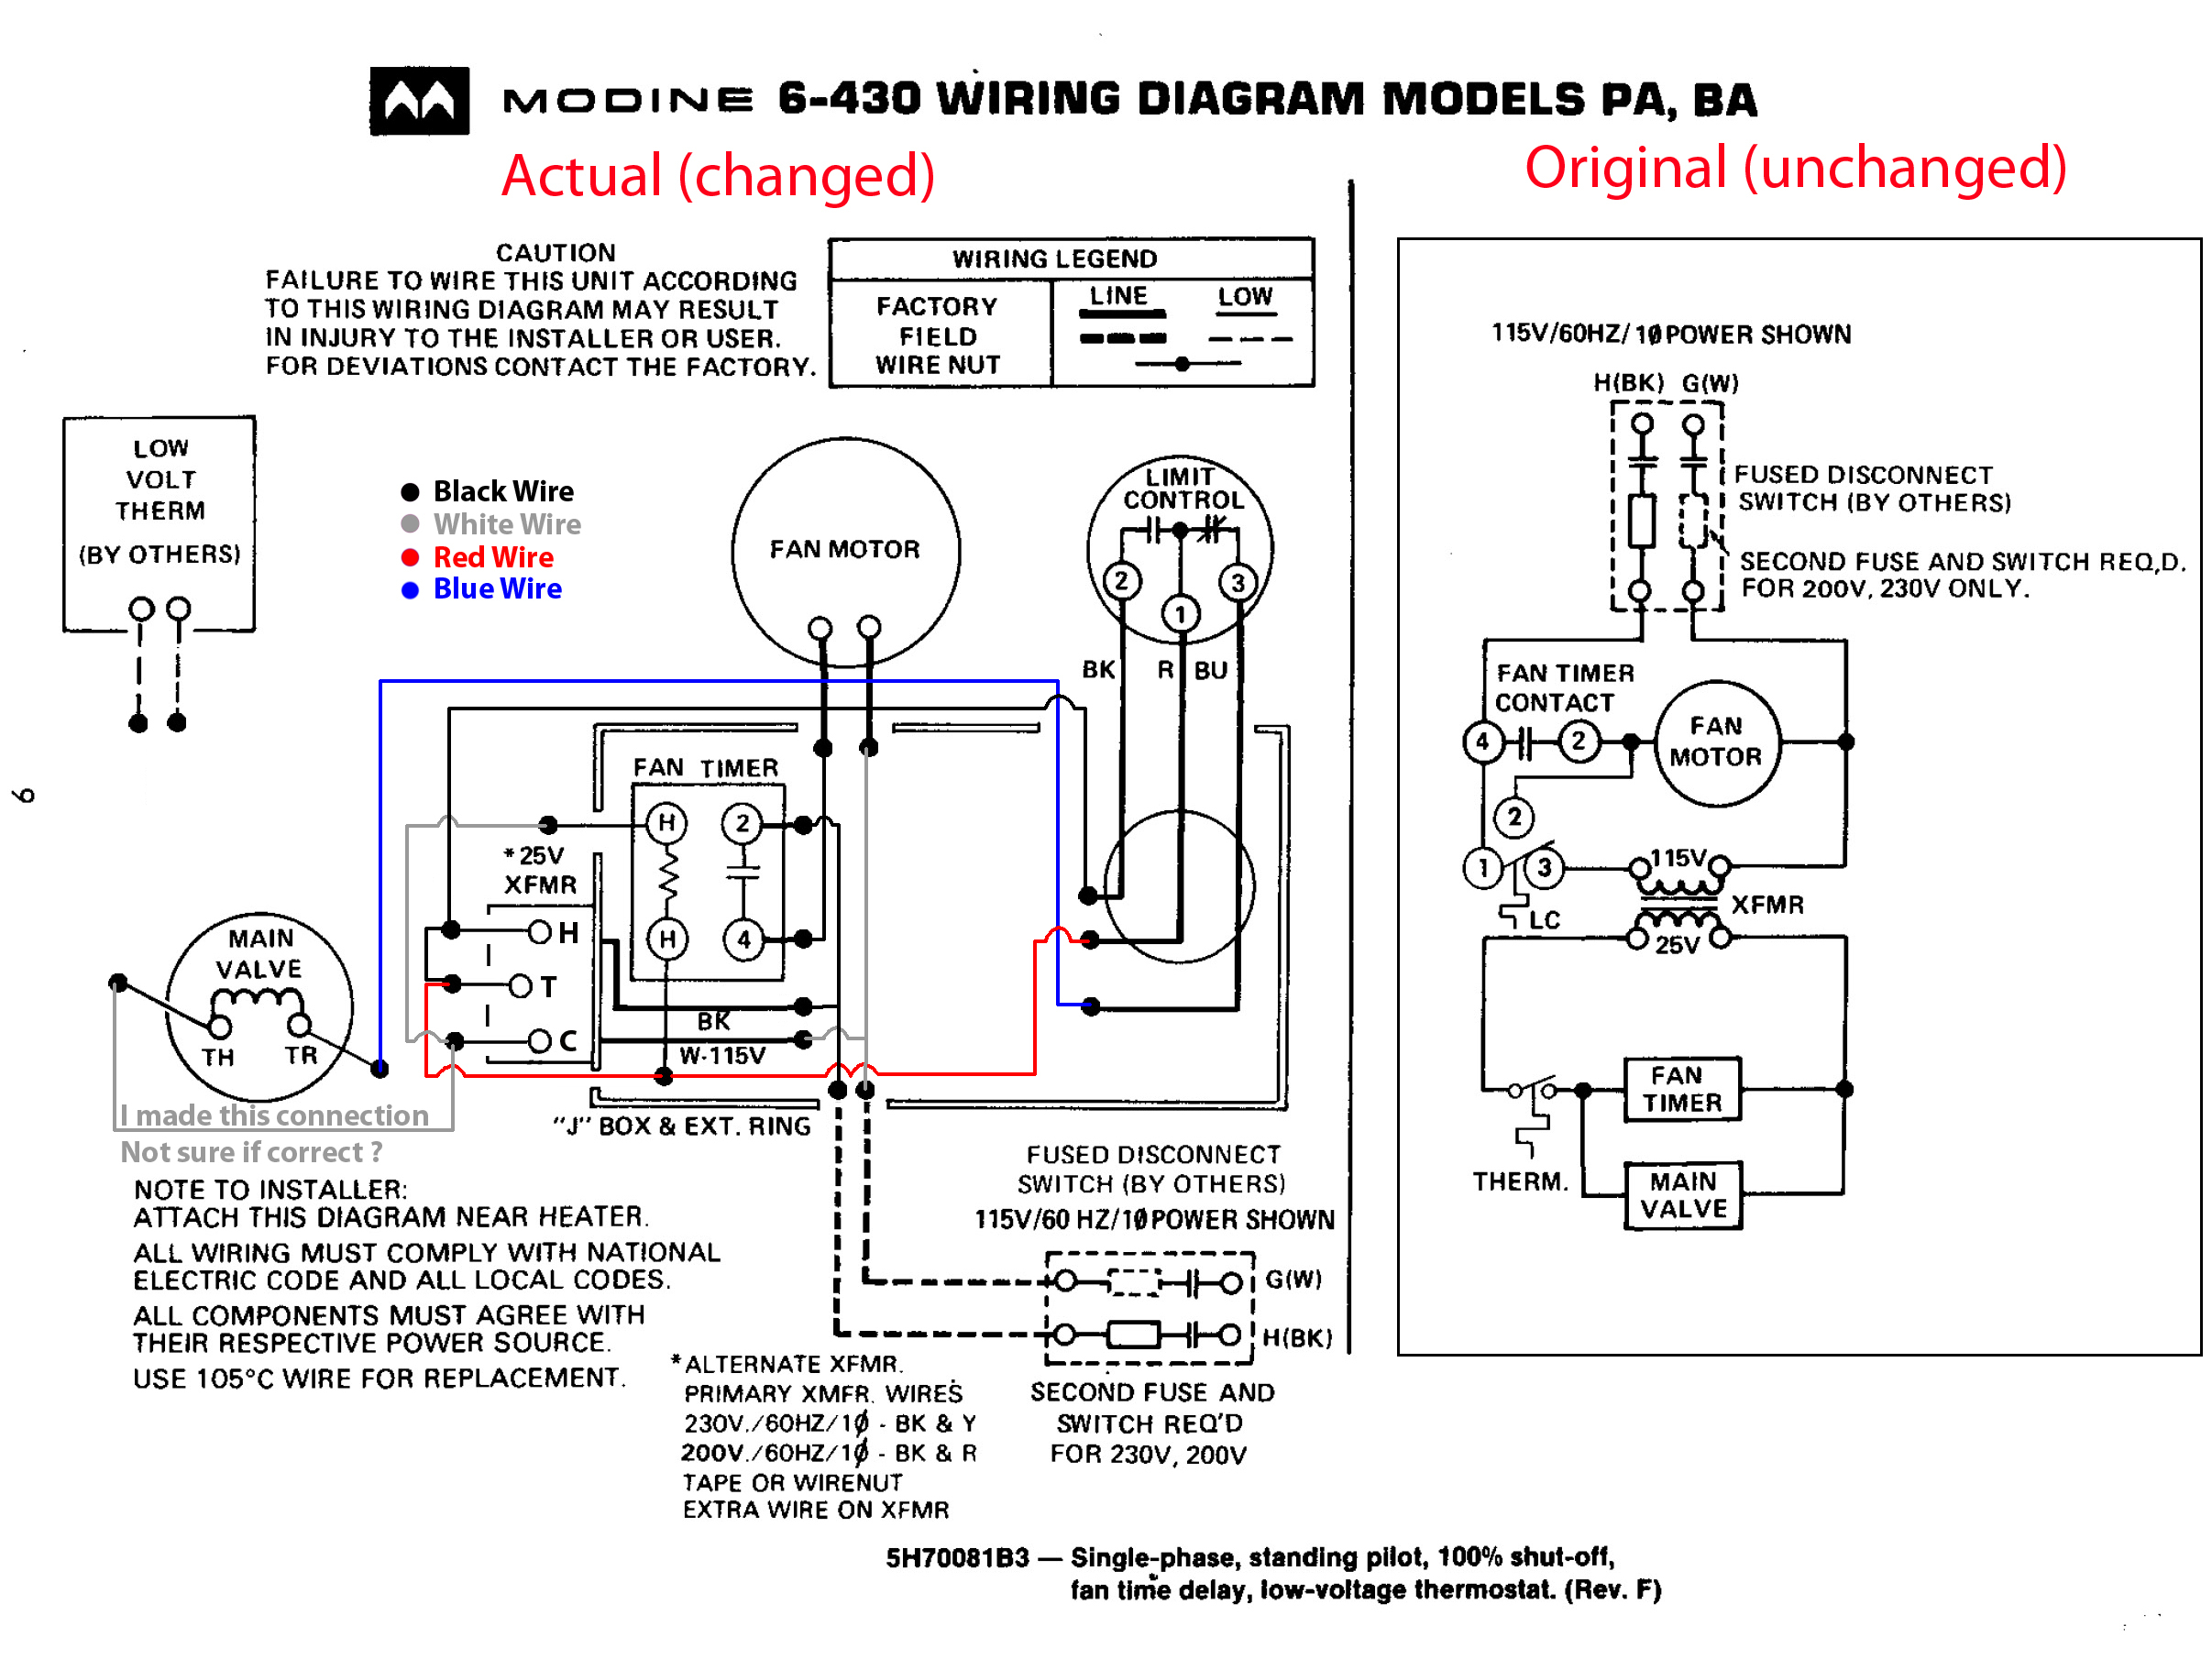 Modine Wiring Diagram - Wiring Liry Diagram H7